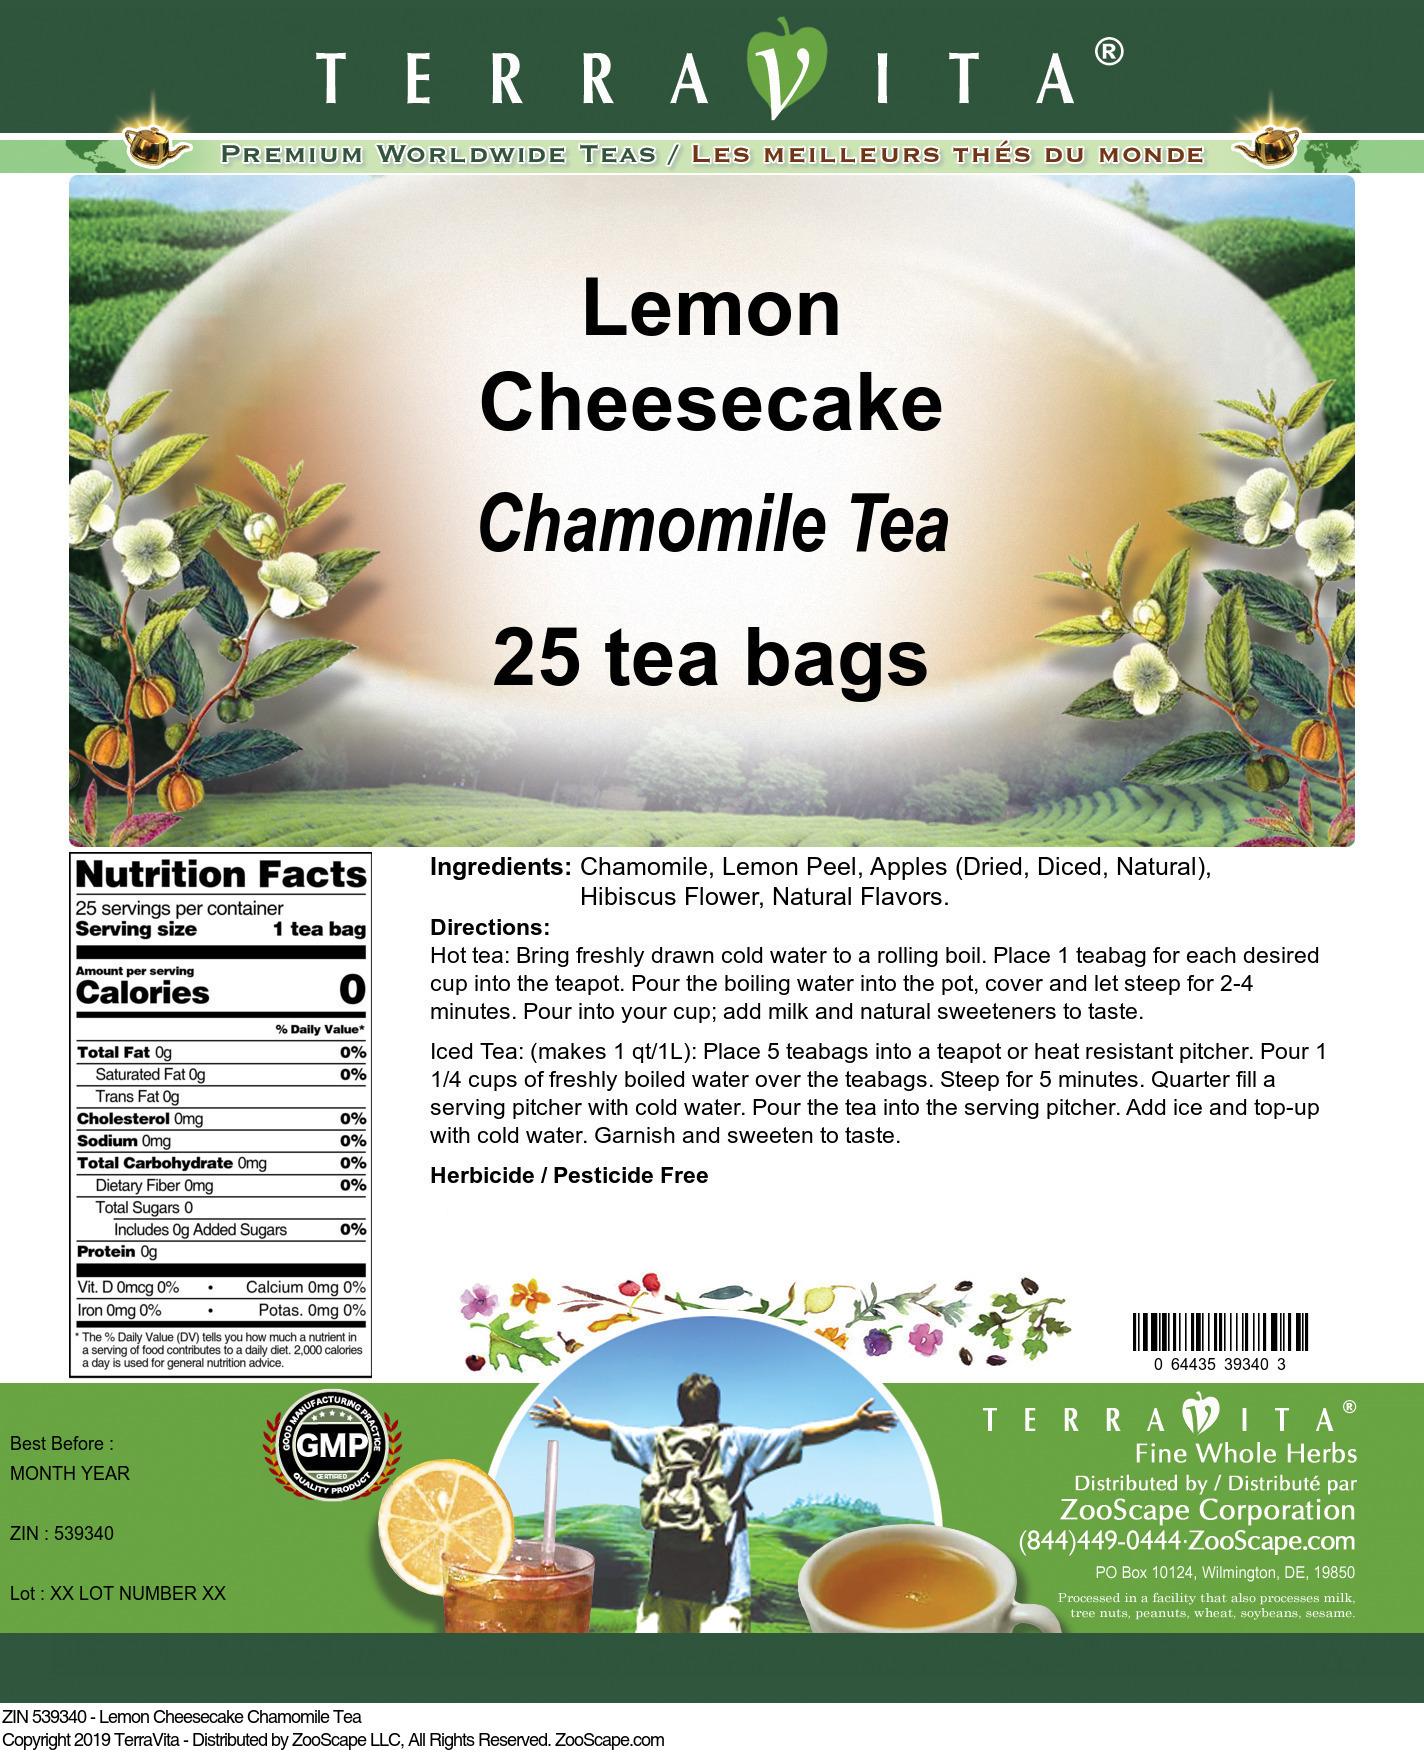 Lemon Cheesecake Chamomile Tea